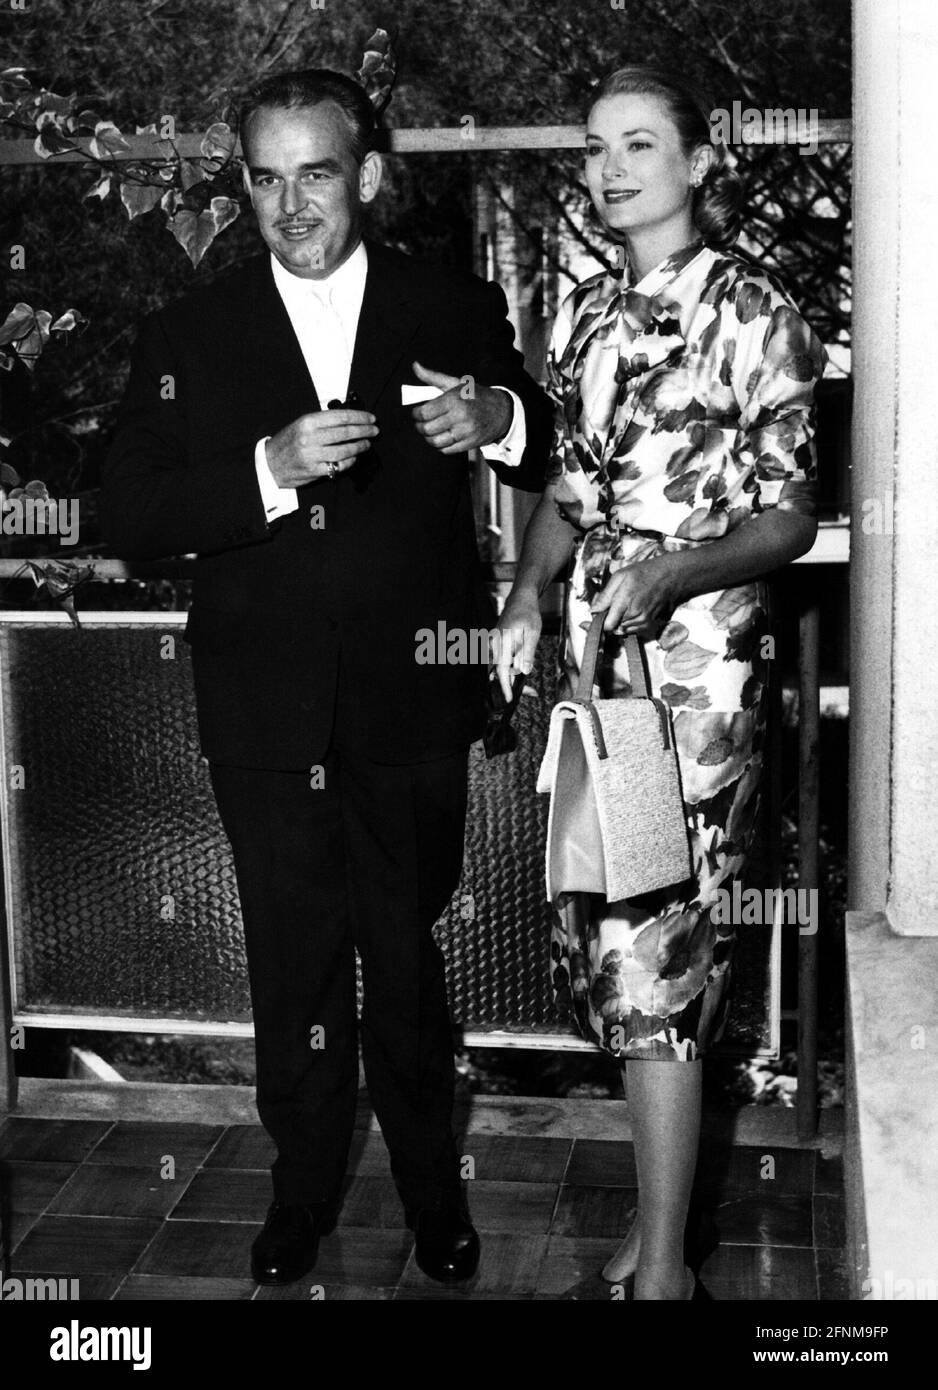 Kelly, Grace, 12.11.1929 - 14.9.1982, amerikanische Schauspielerin, halbe Länge, ADDITIONAL-RIGHTS-CLEARANCE-INFO-NOT-AVAILABLE Stockfoto